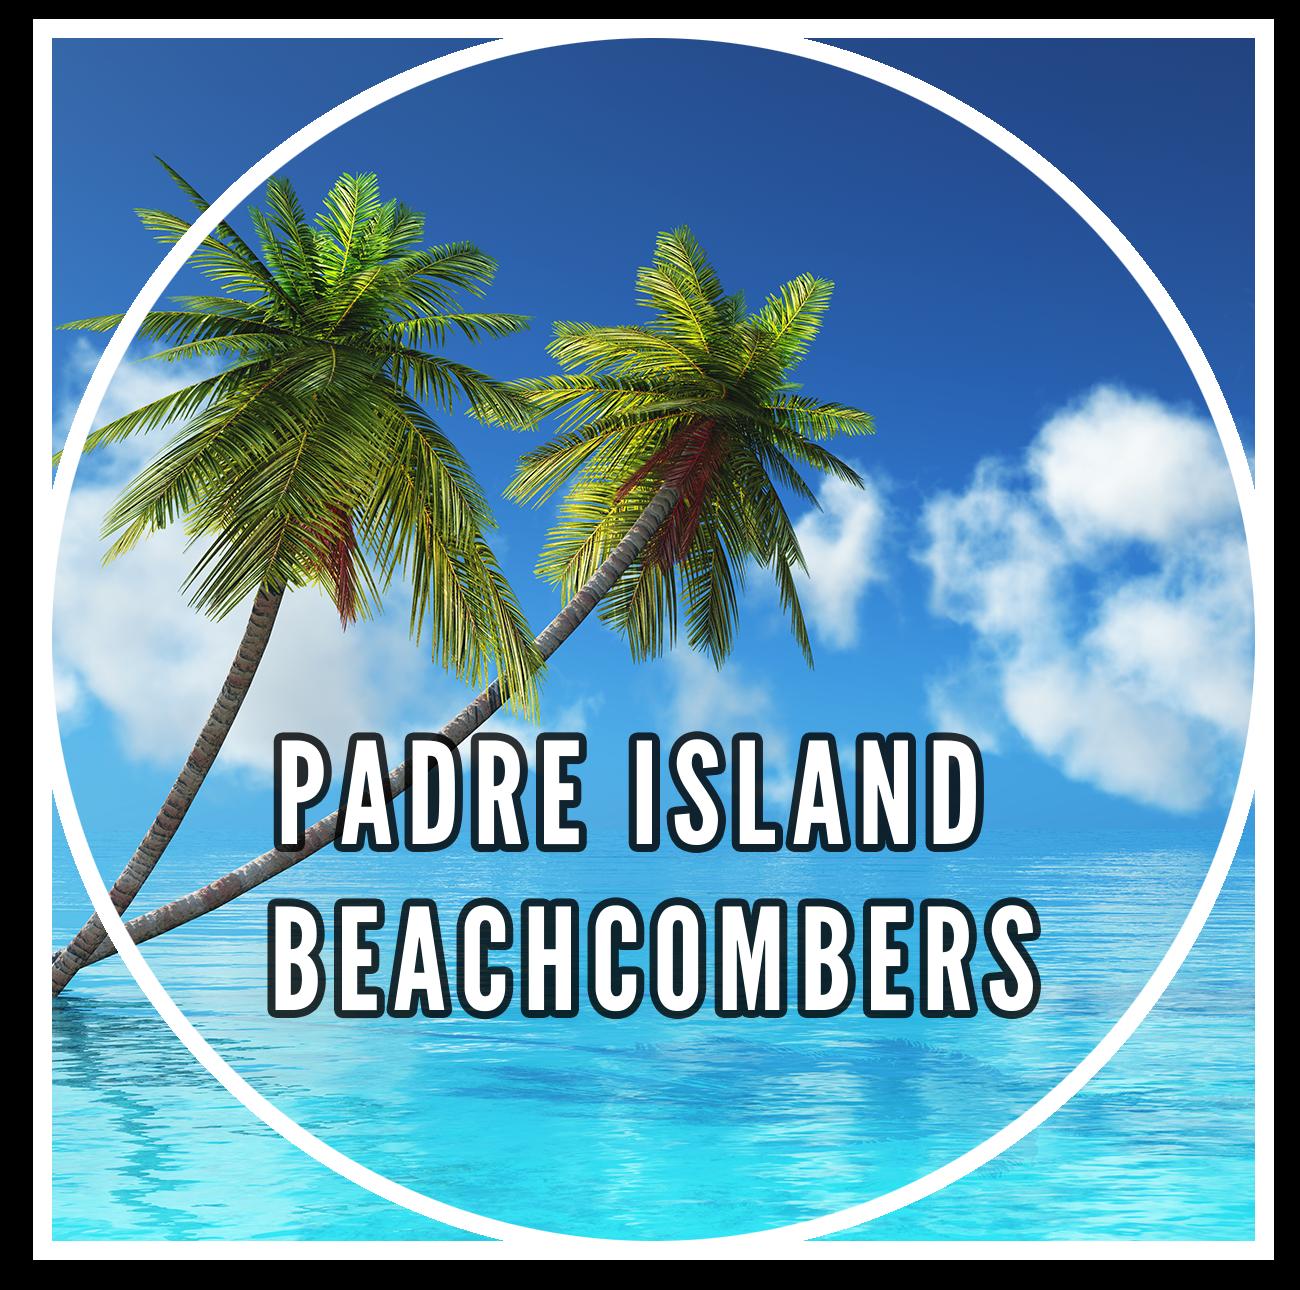 beachcomb.png